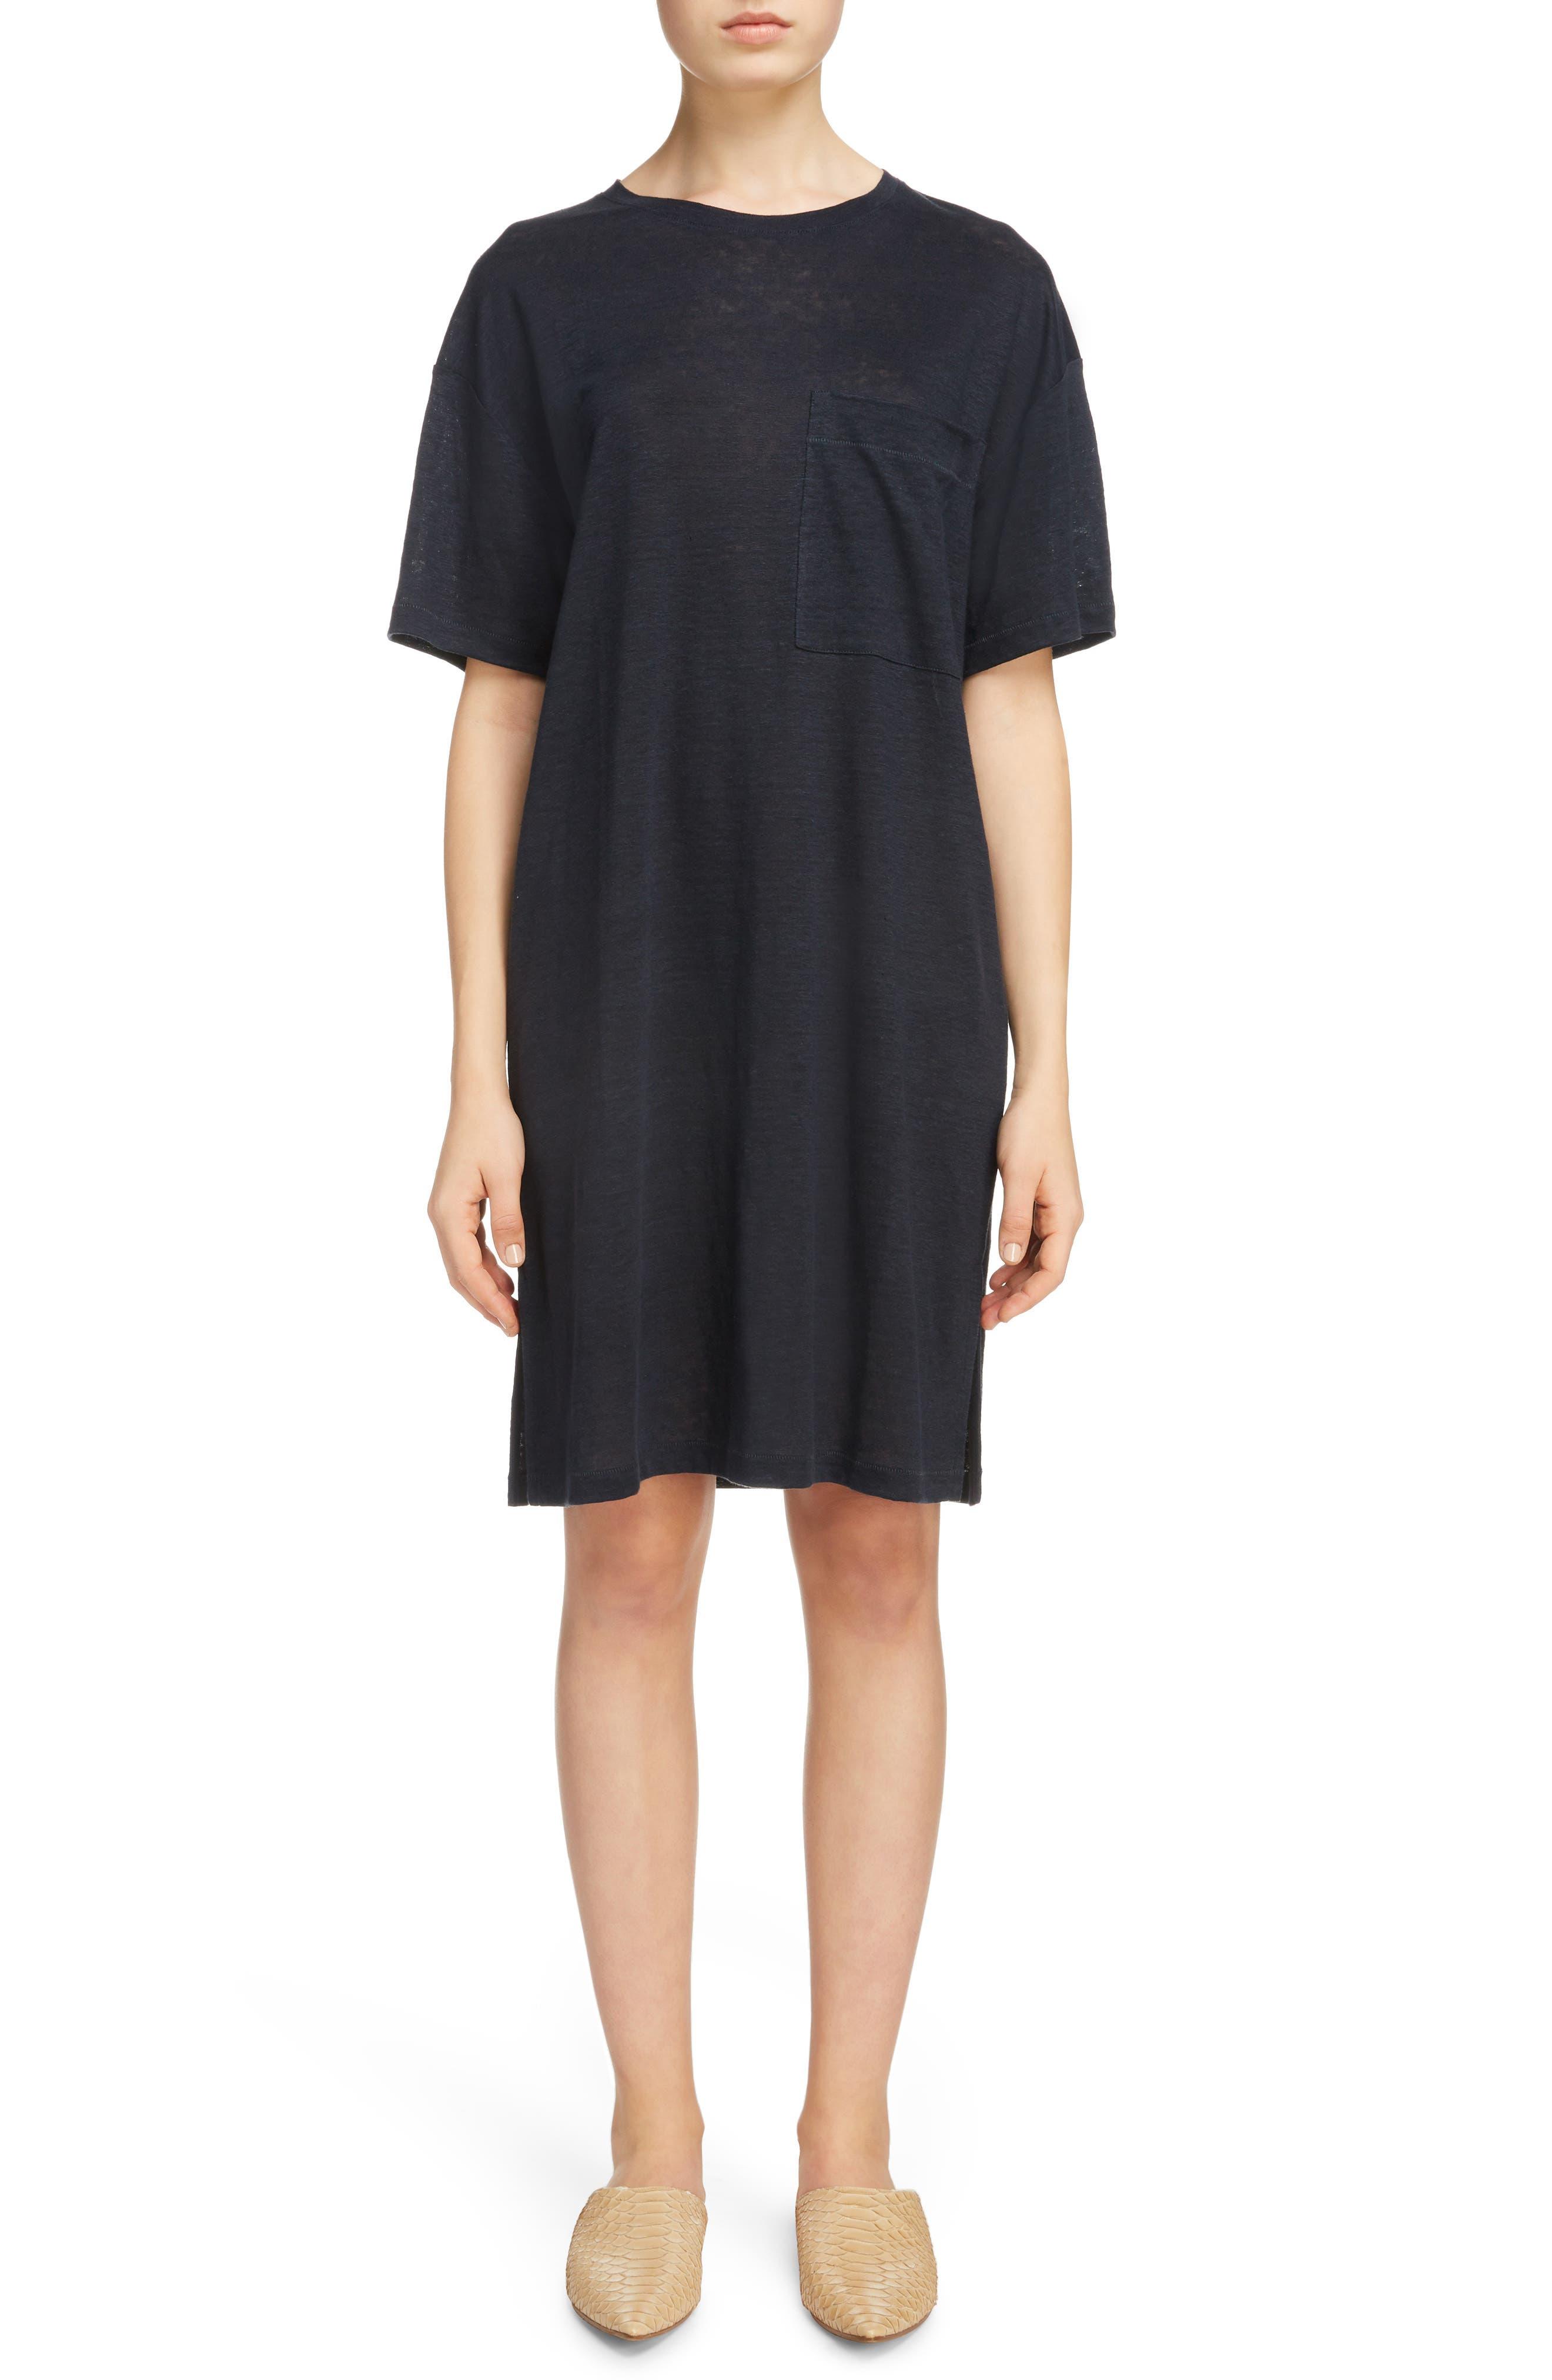 Acne Studios Saga Linen T-Shirt Dress